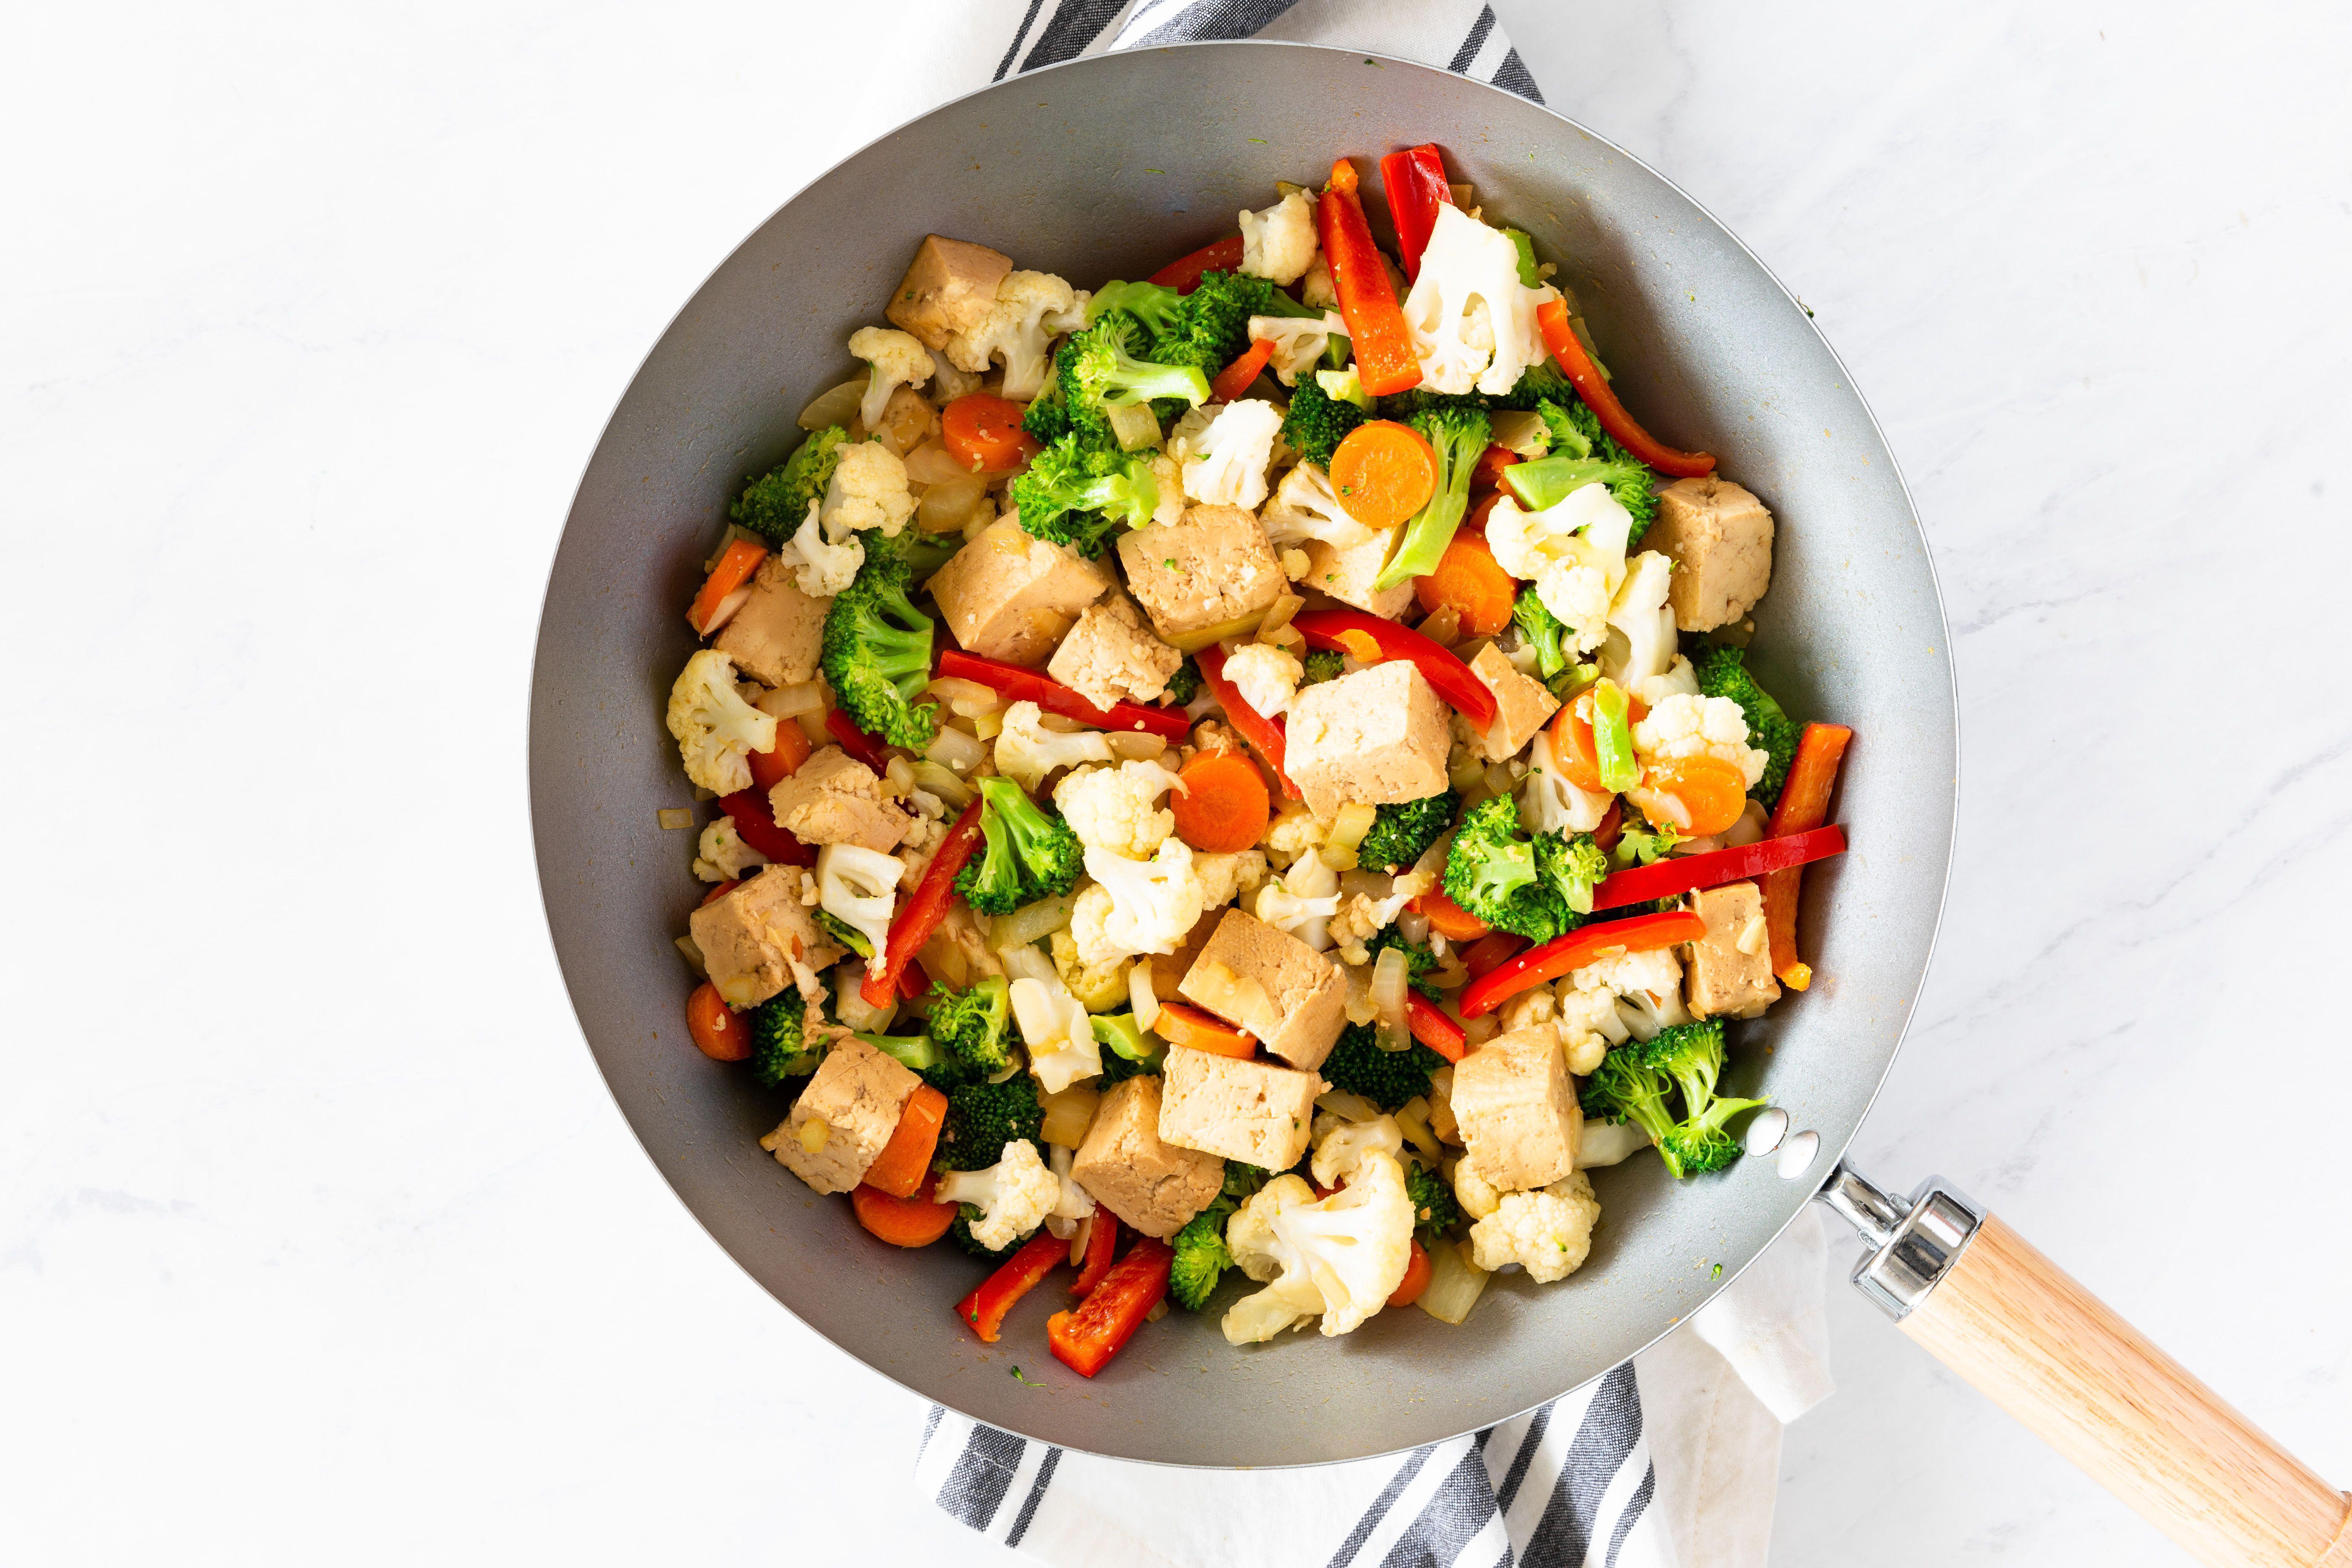 Tofu and veggies in a wok